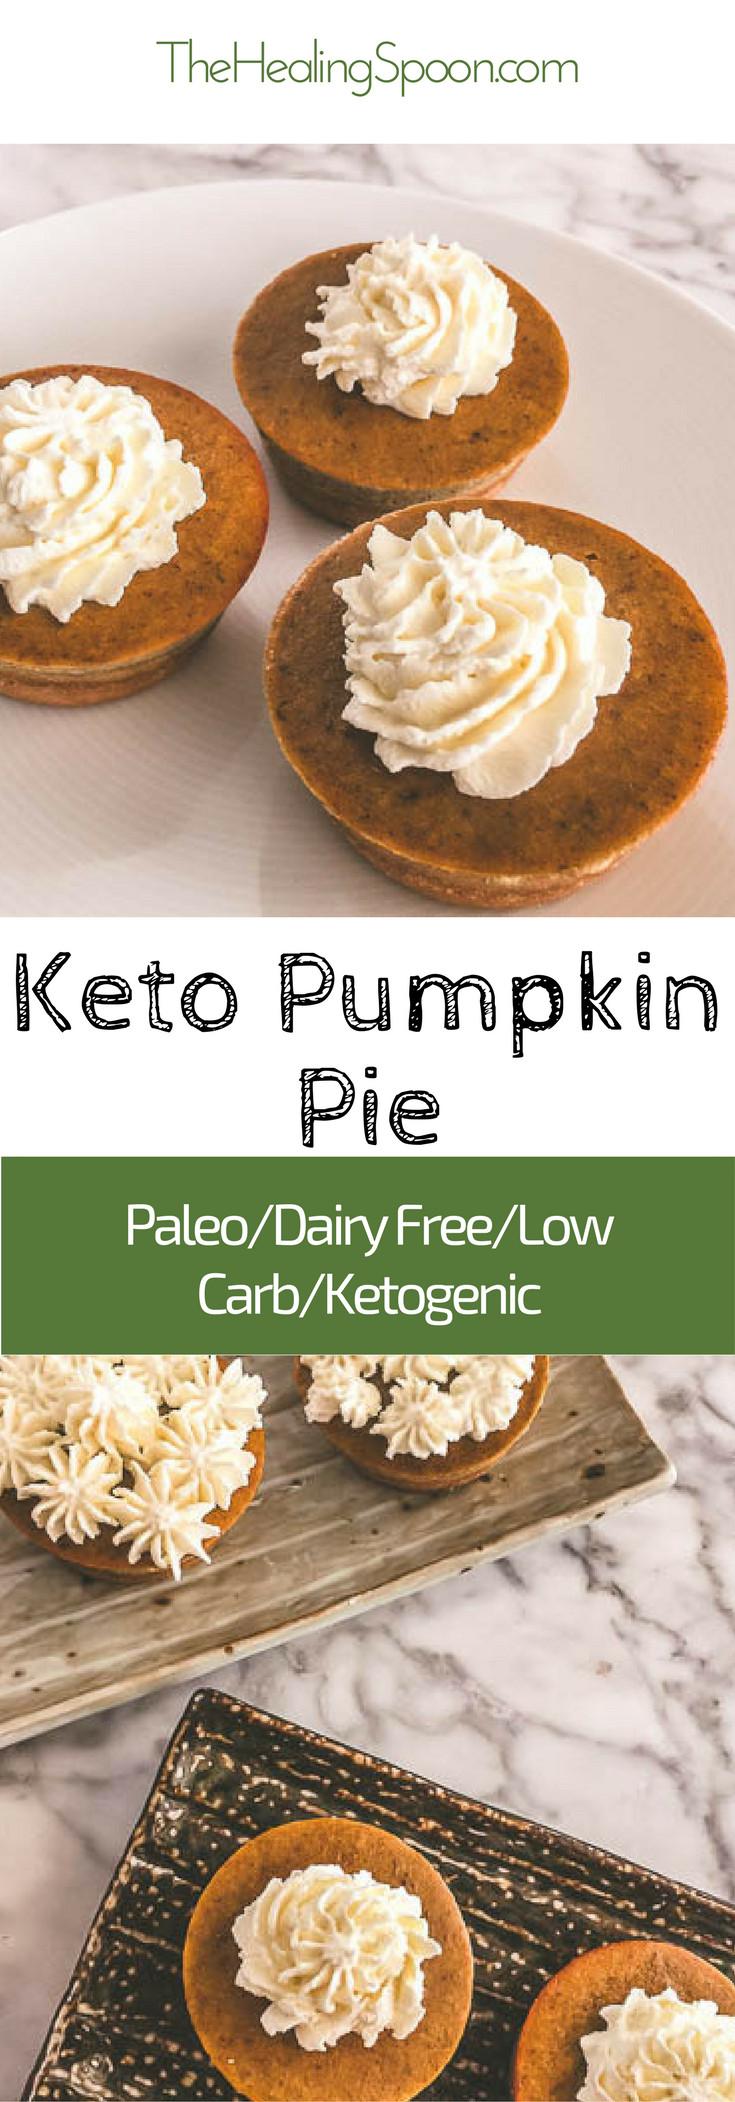 Keto Pumpkin Pie  keto lowcarb dairy free paleo mini pumpkin pie